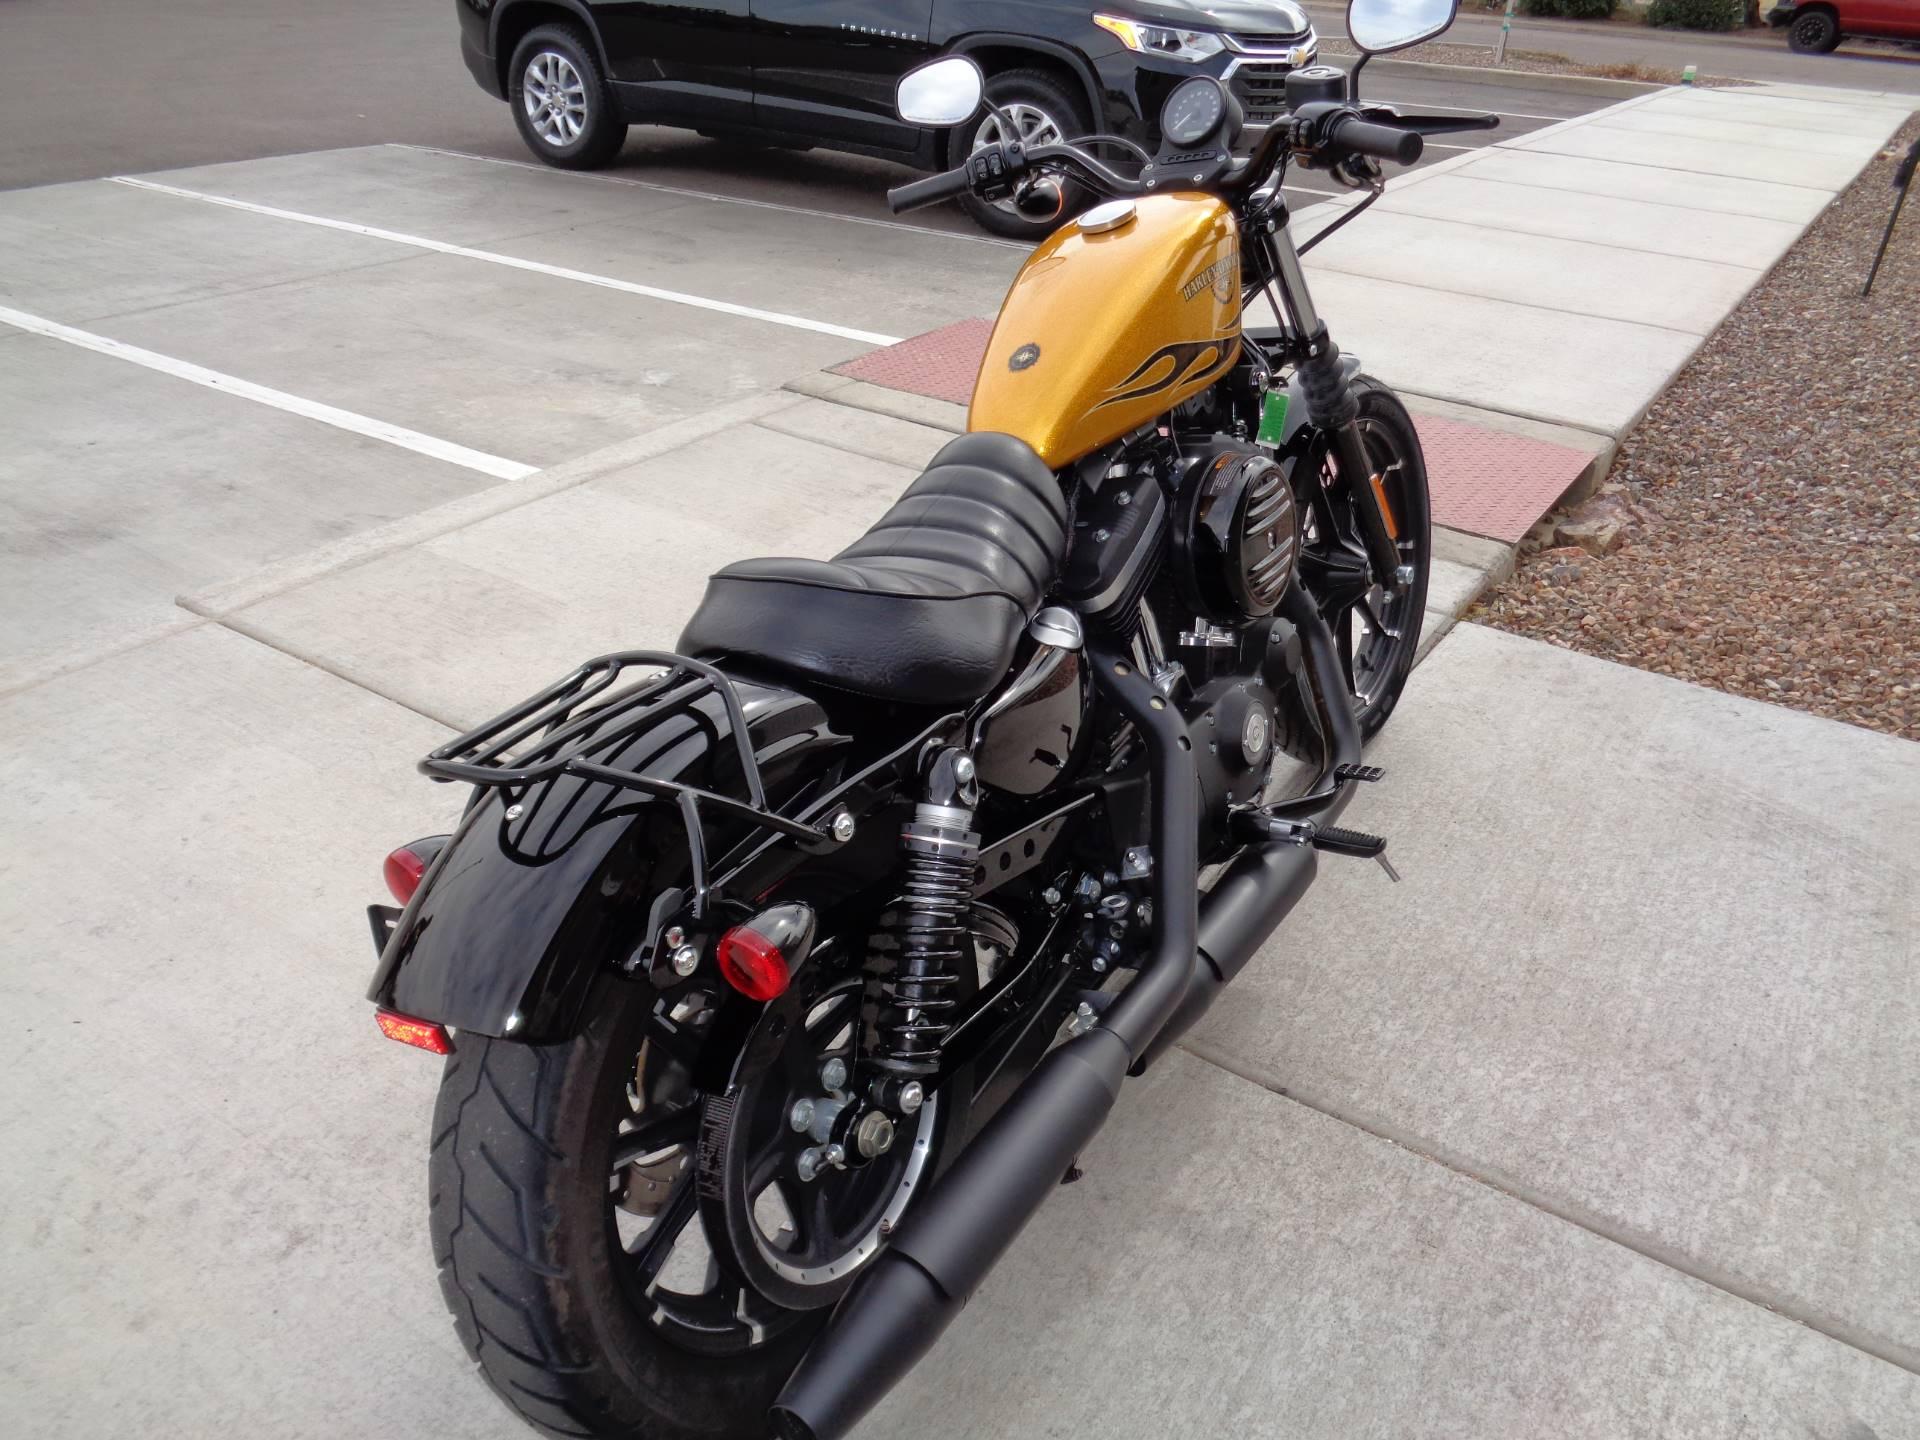 2016 Harley-Davidson Iron 883 6